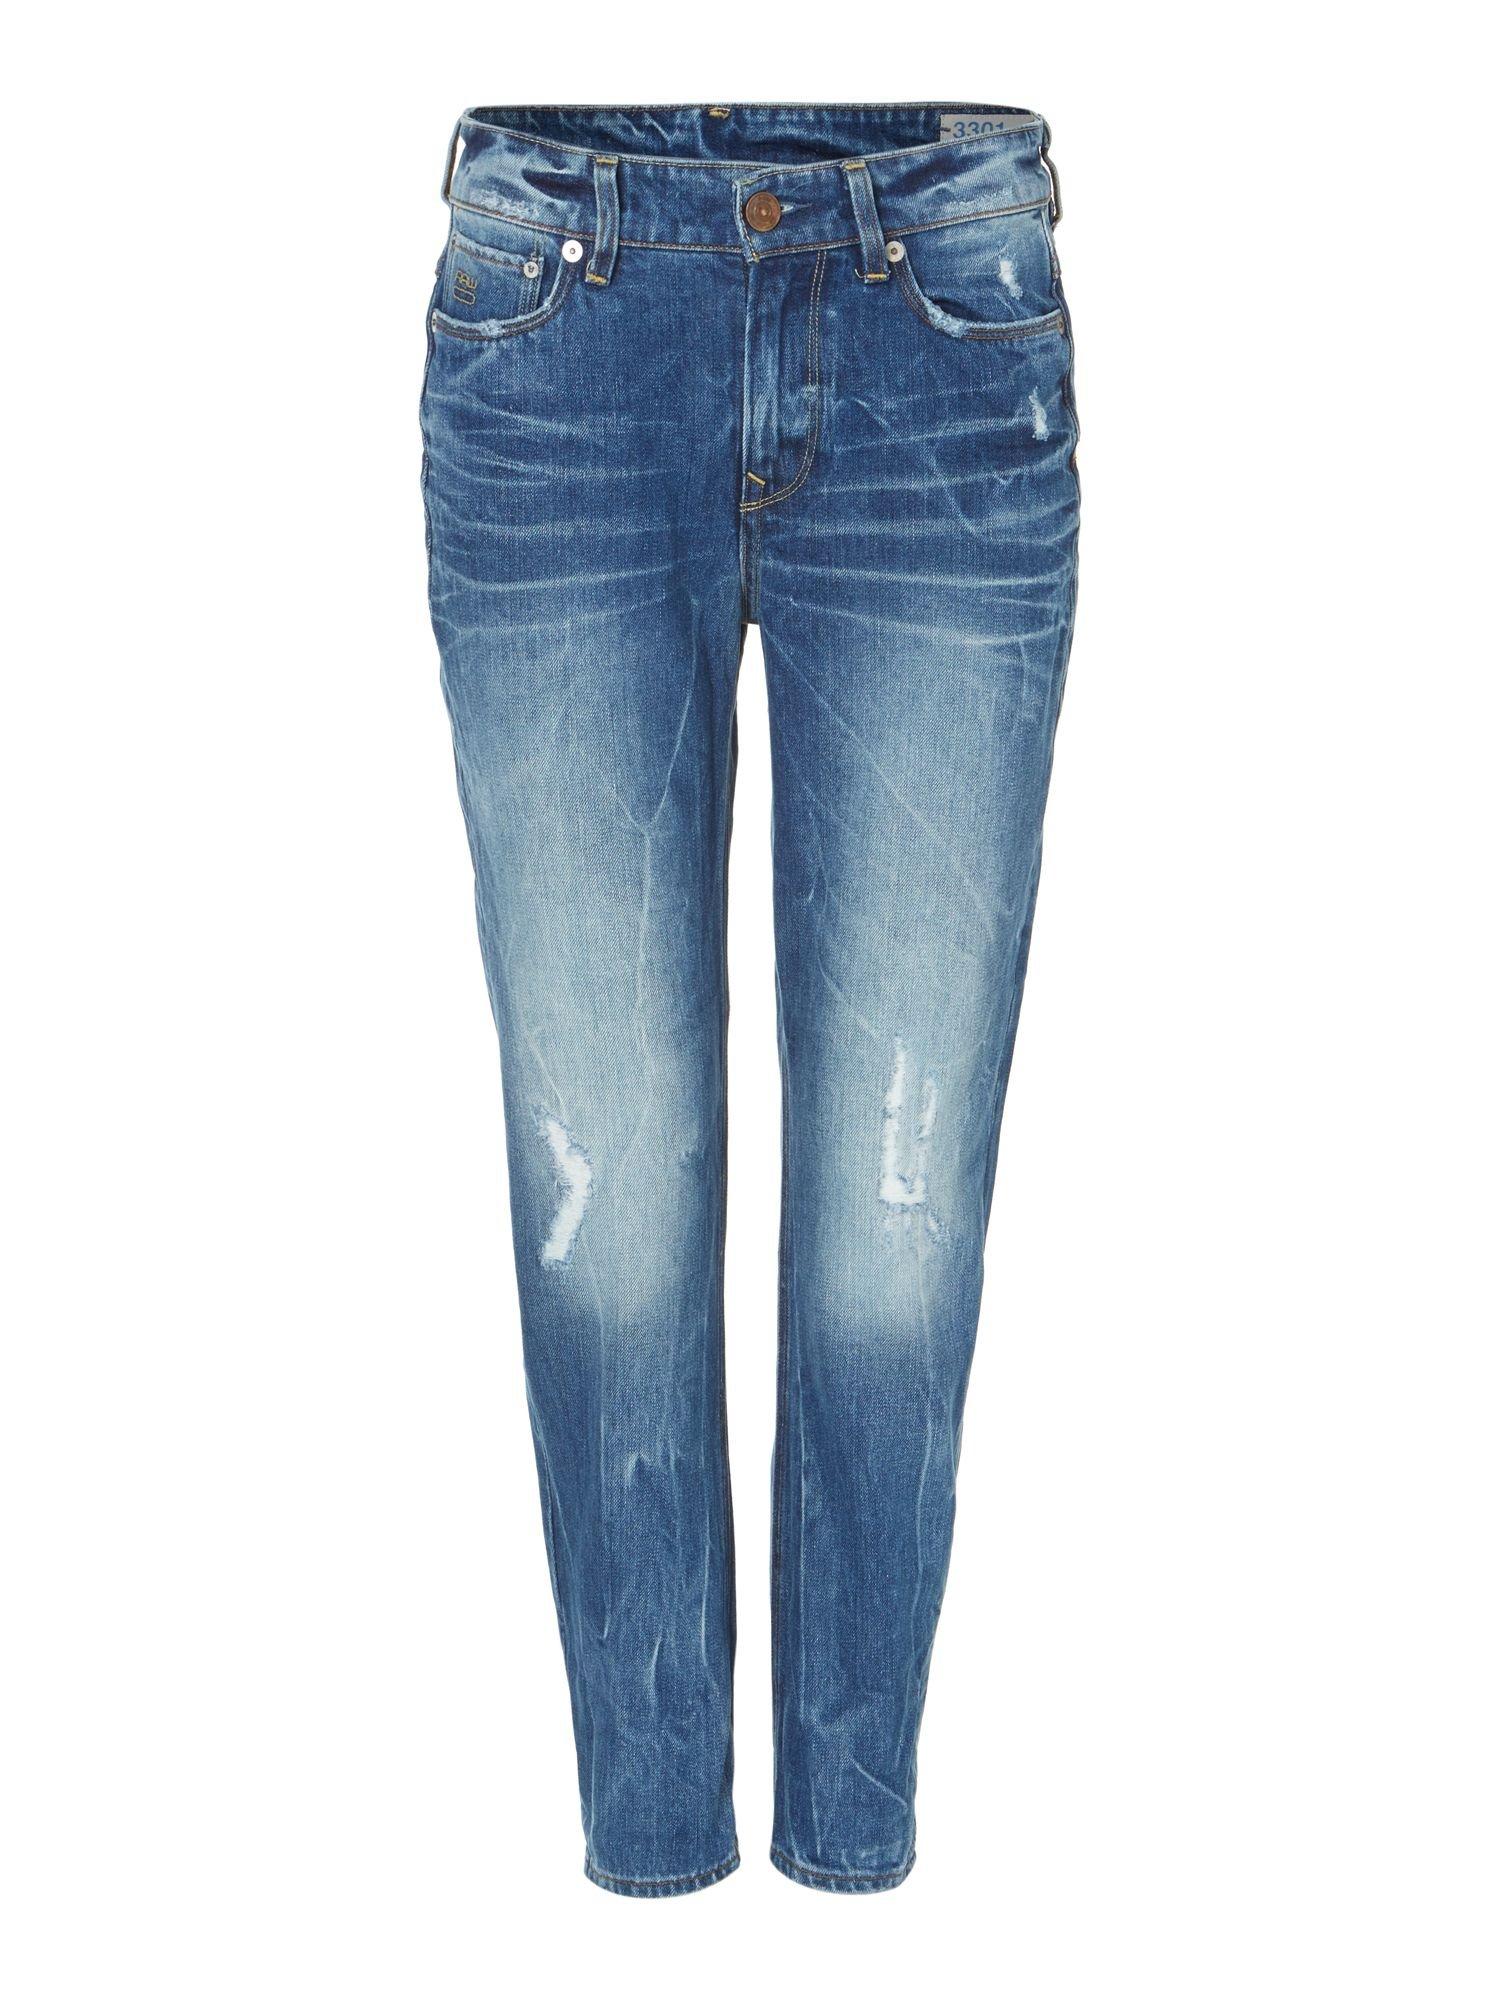 g star raw 3301 tapered boyfriend jeans in wisk denim in. Black Bedroom Furniture Sets. Home Design Ideas